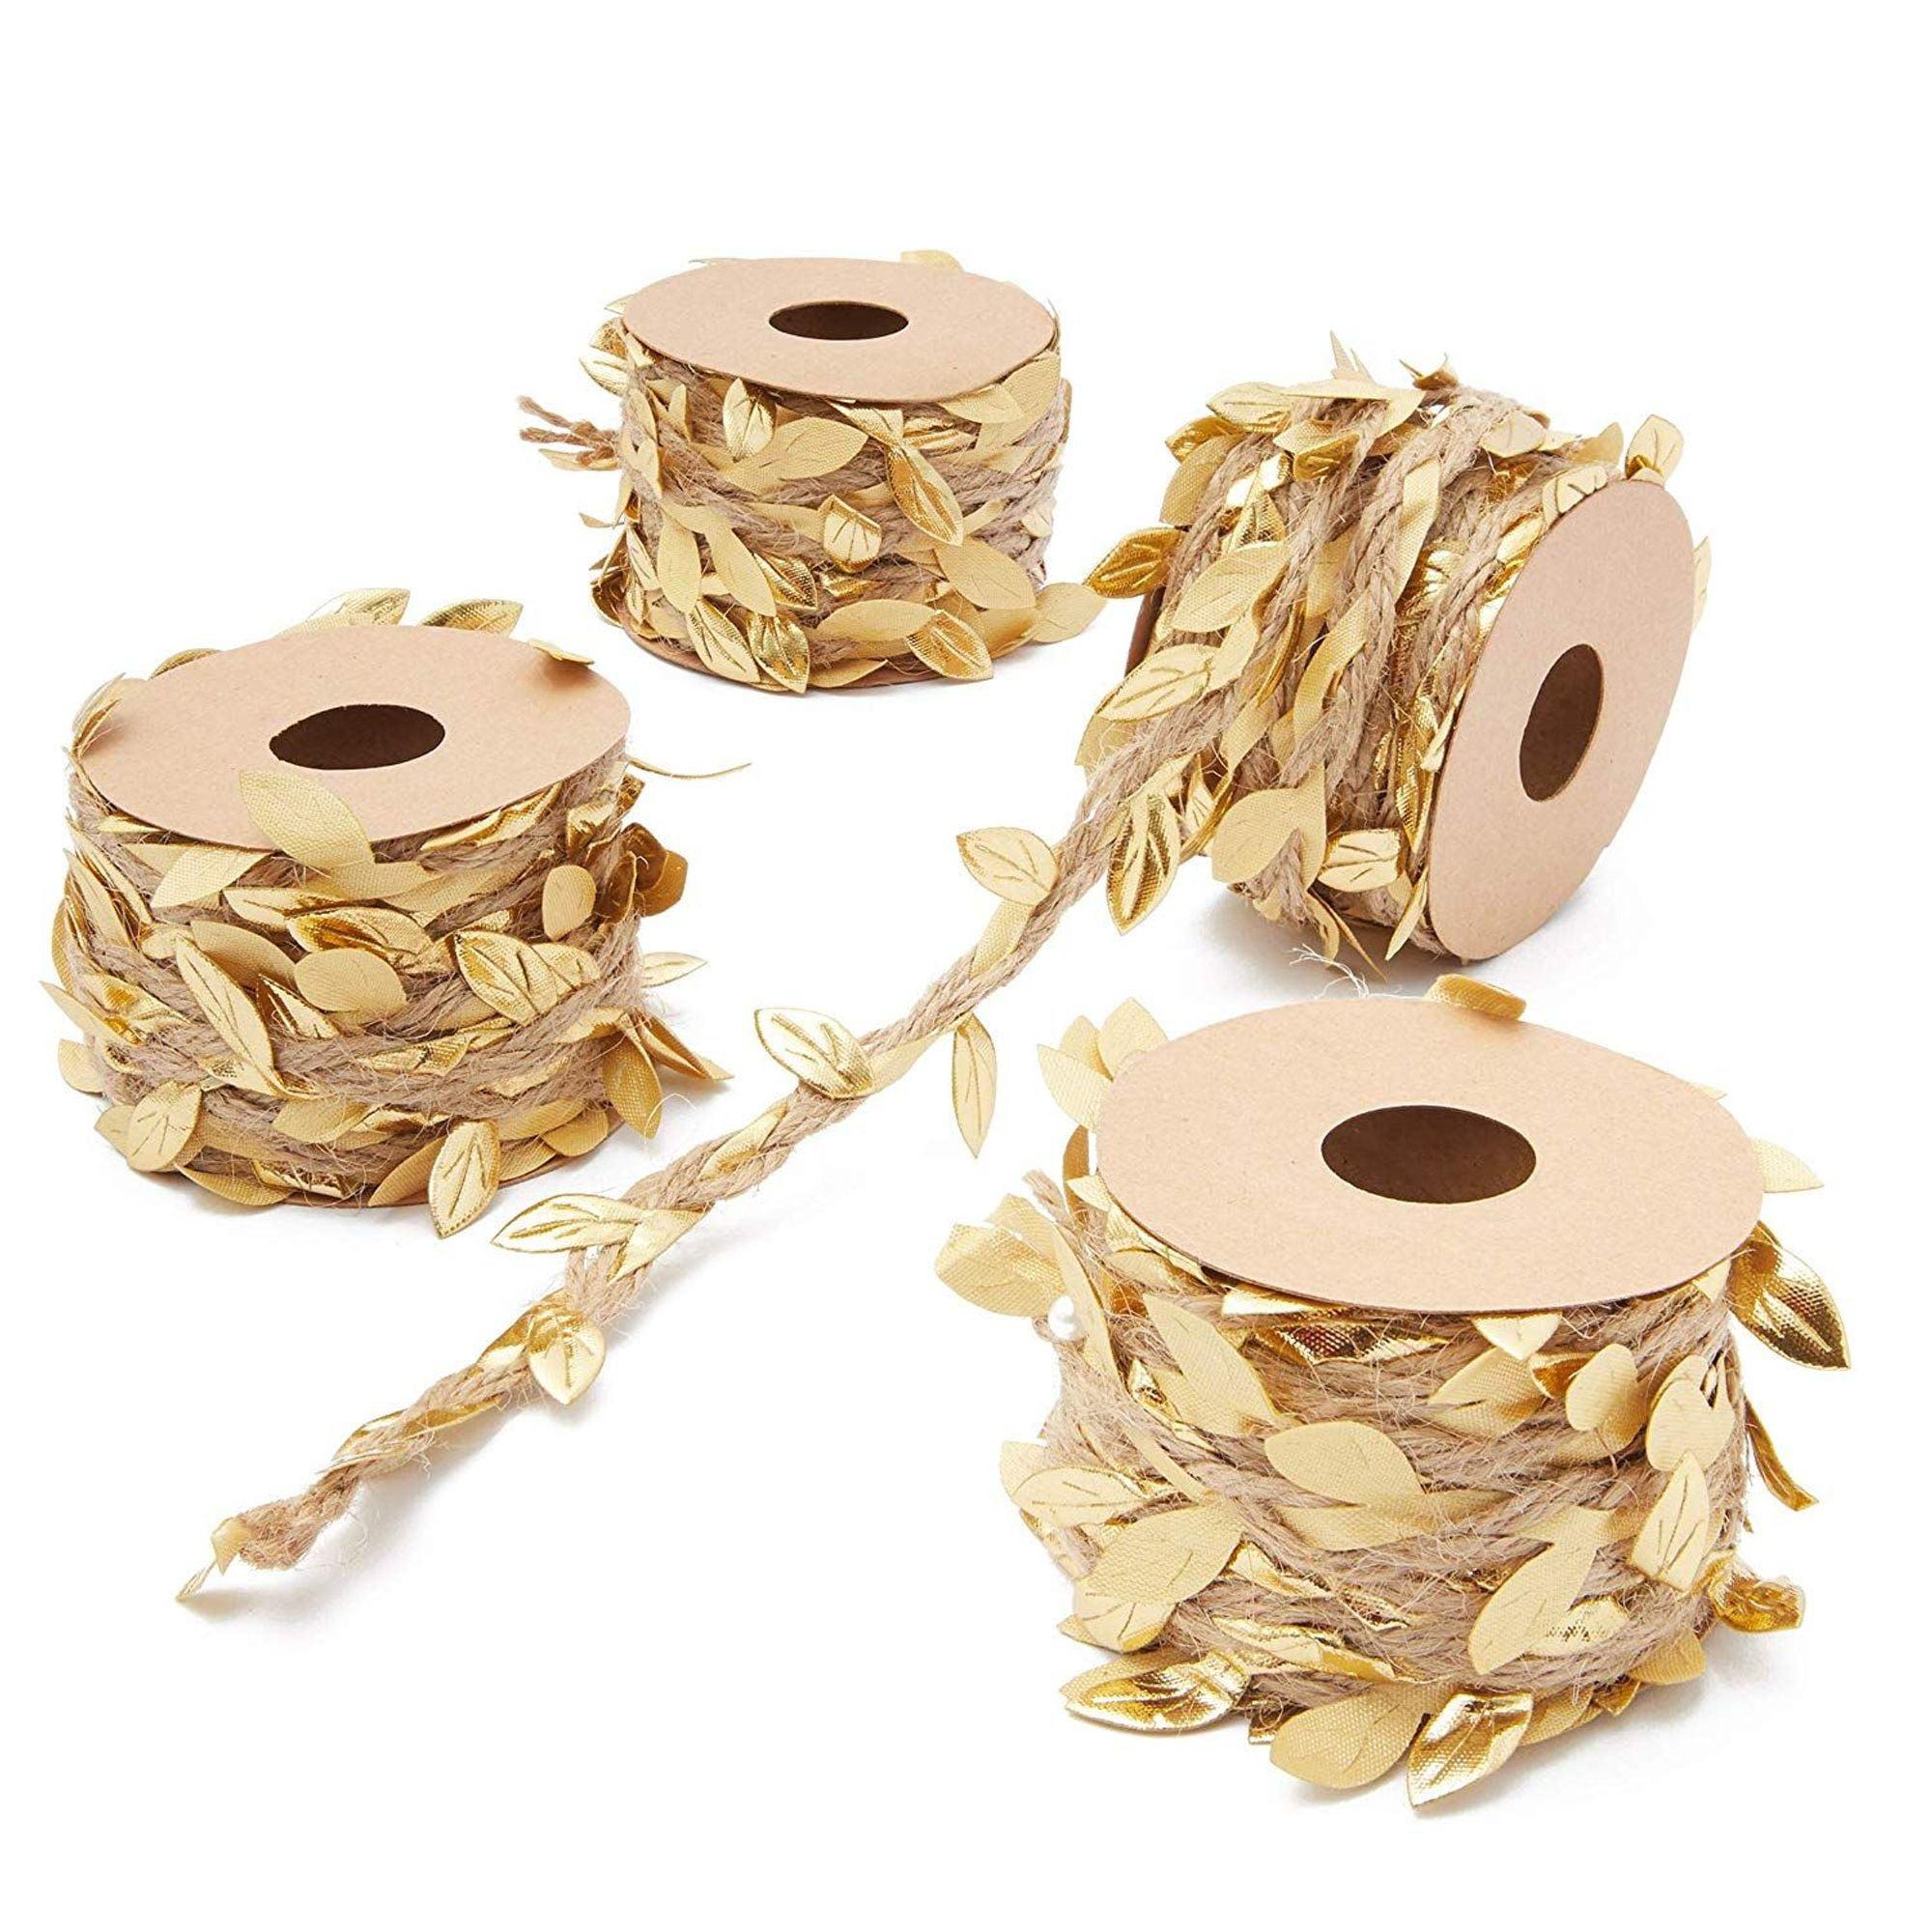 4 Rolls Jute Burlap Vine Twine Artificial Fake Gold Leaf Leaves Garland For Wedding Bridal Shower Party Garden Home Decoration Diy Crafts And Gift Wreaths Wrapping Metallic Gold Walmart Com Walmart Com